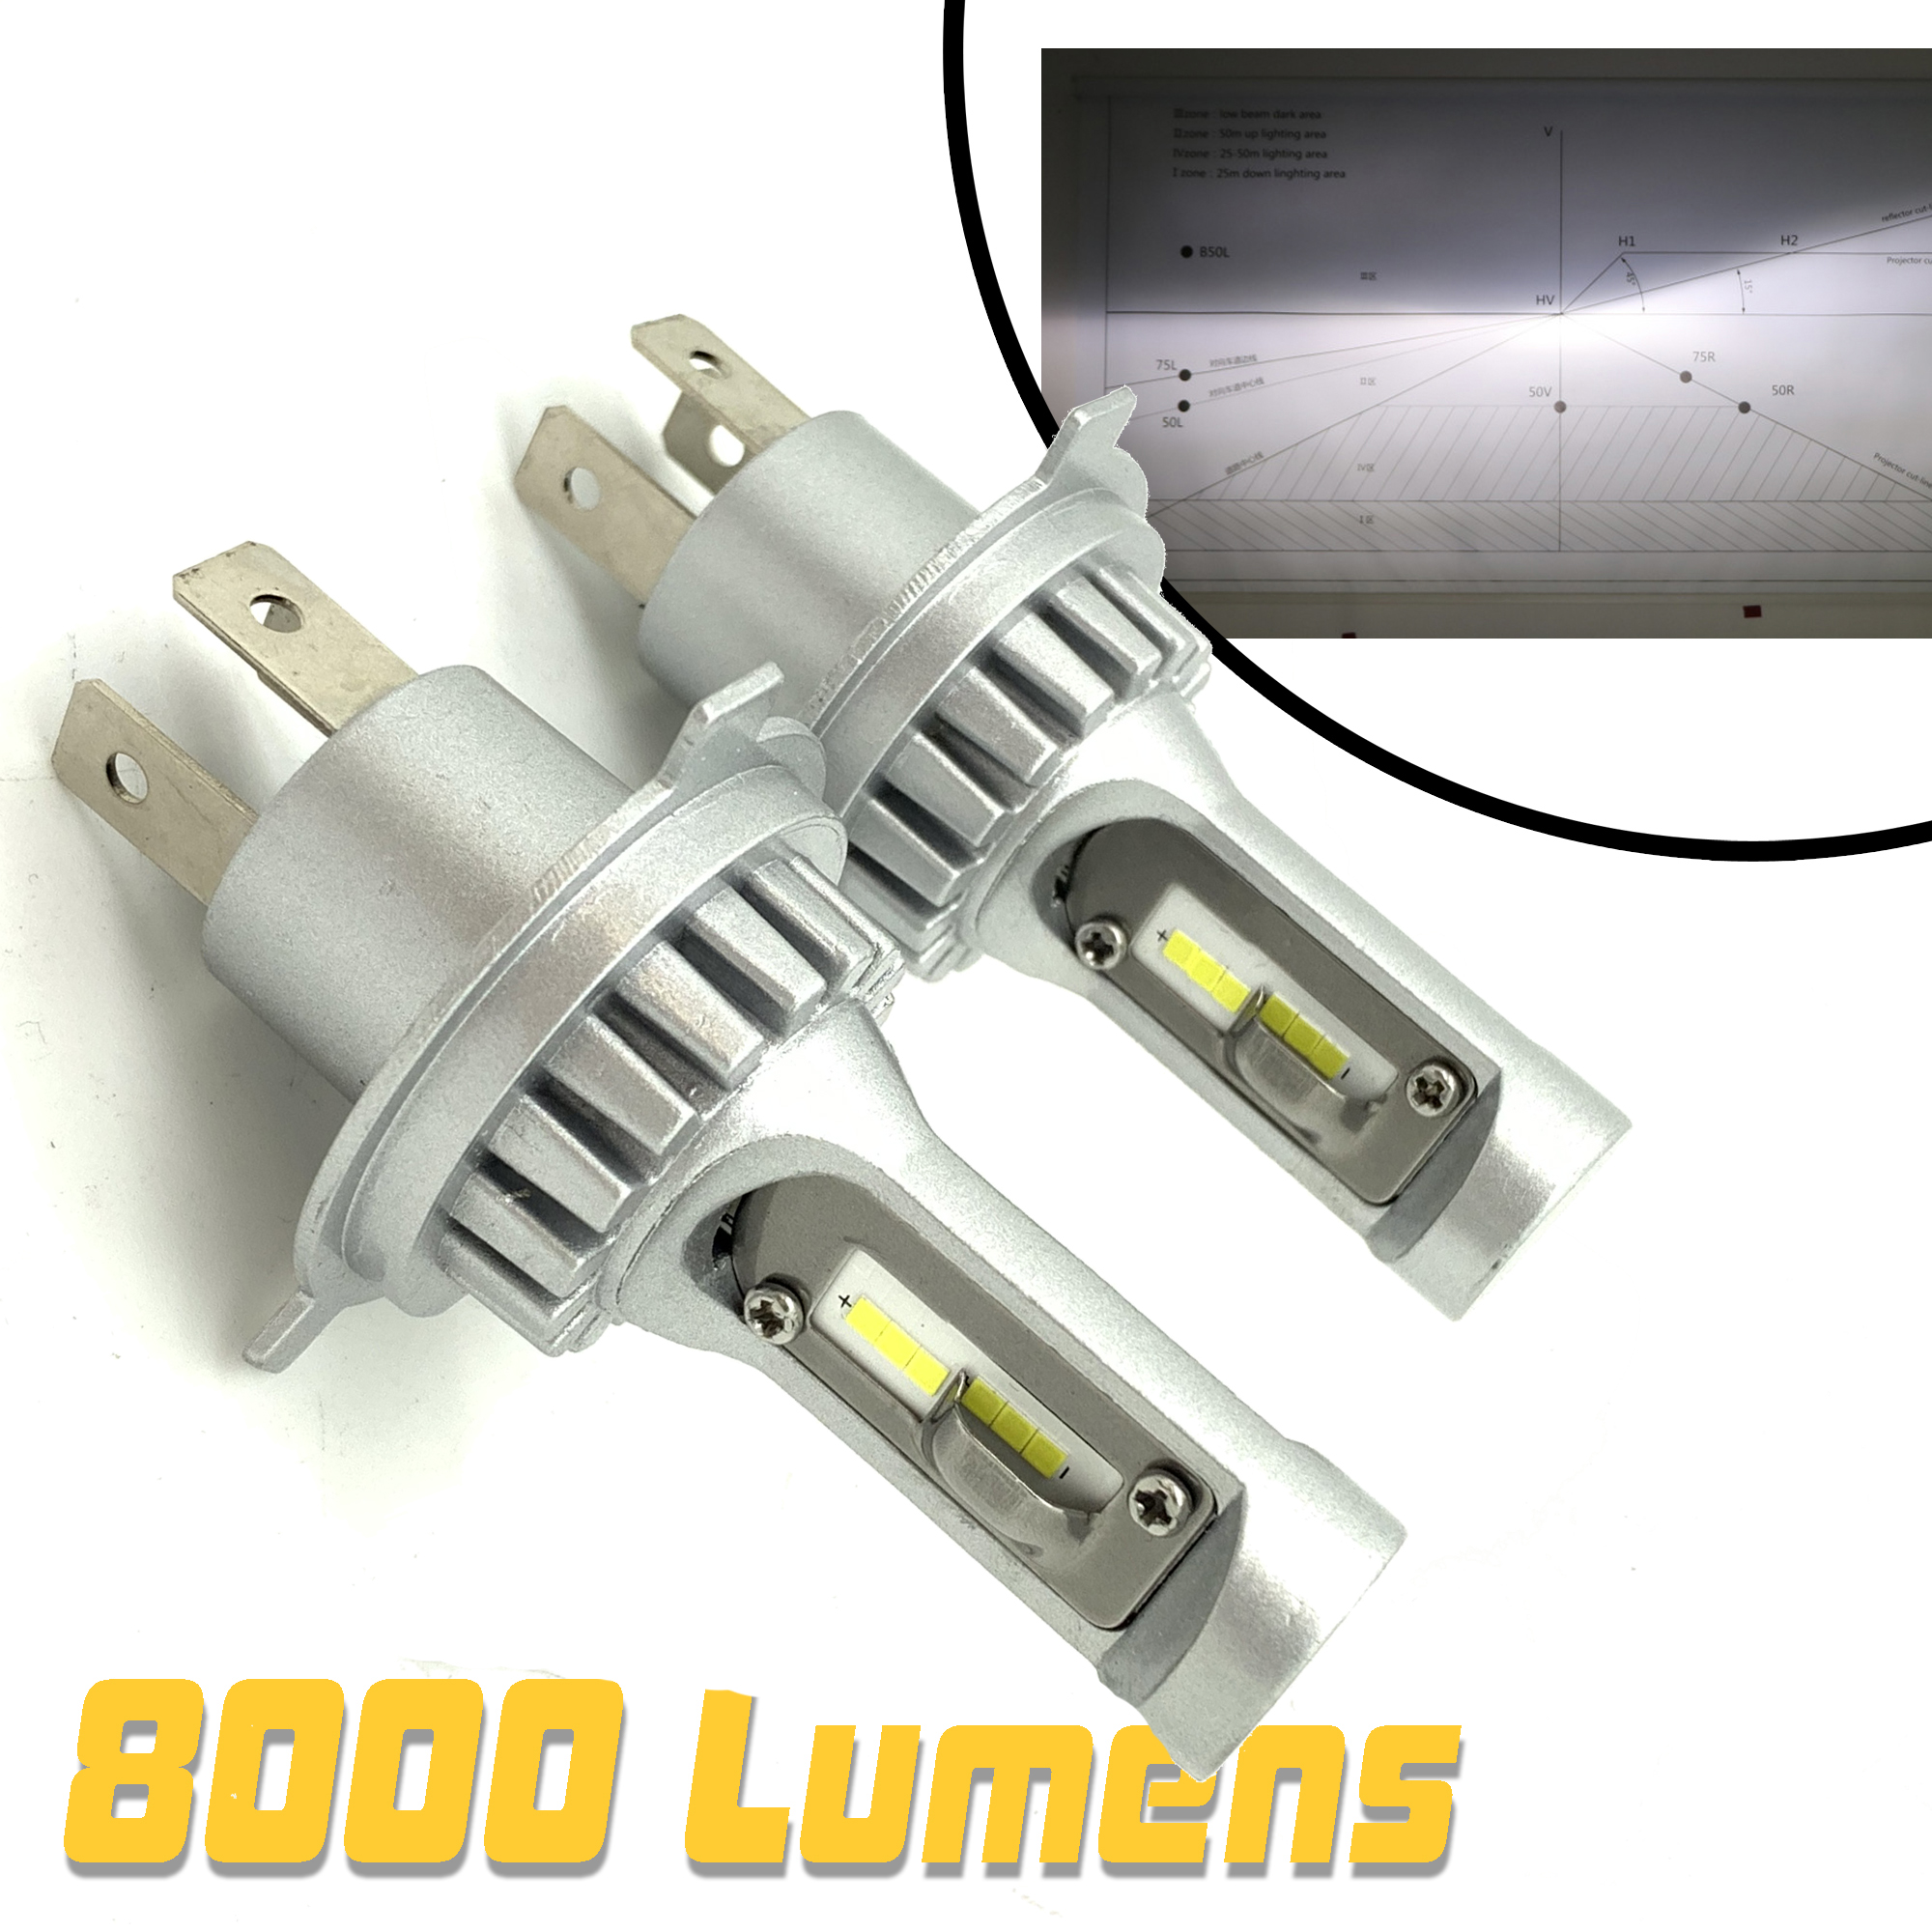 Micro H7 V12 CSP LED Headlight Bulbs Kit 8000lm For Ford Transit 14